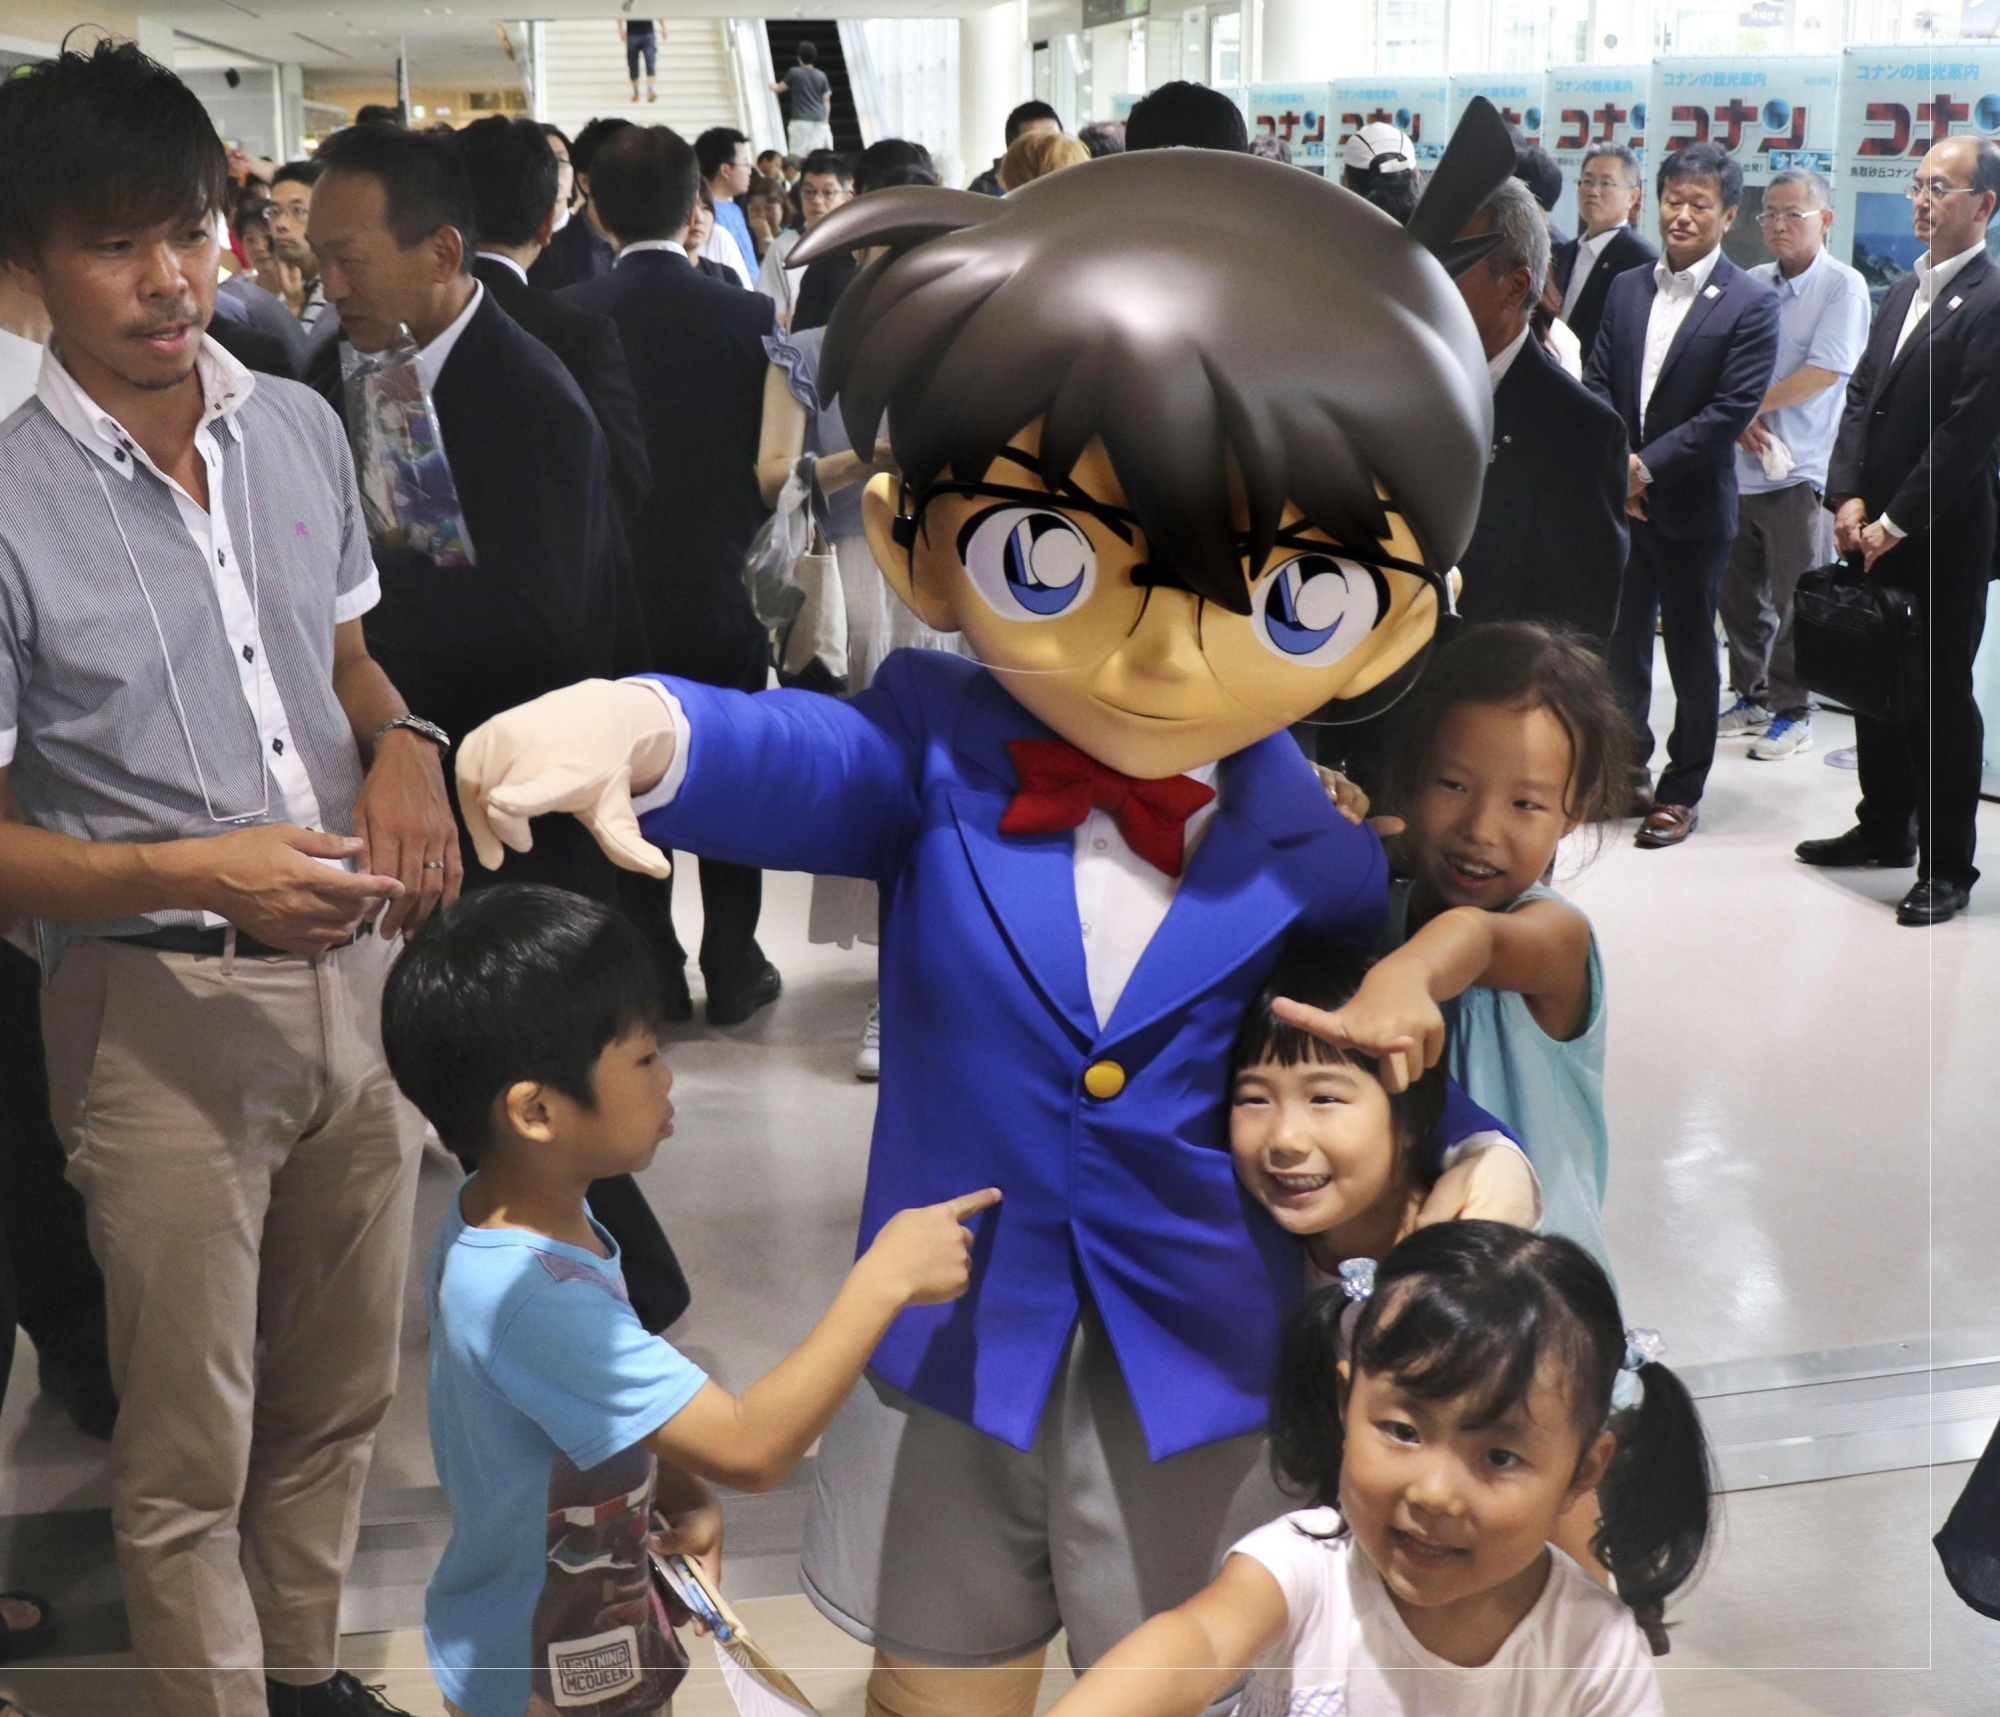 Tottori lufthavn øger deres Detective Conan tema